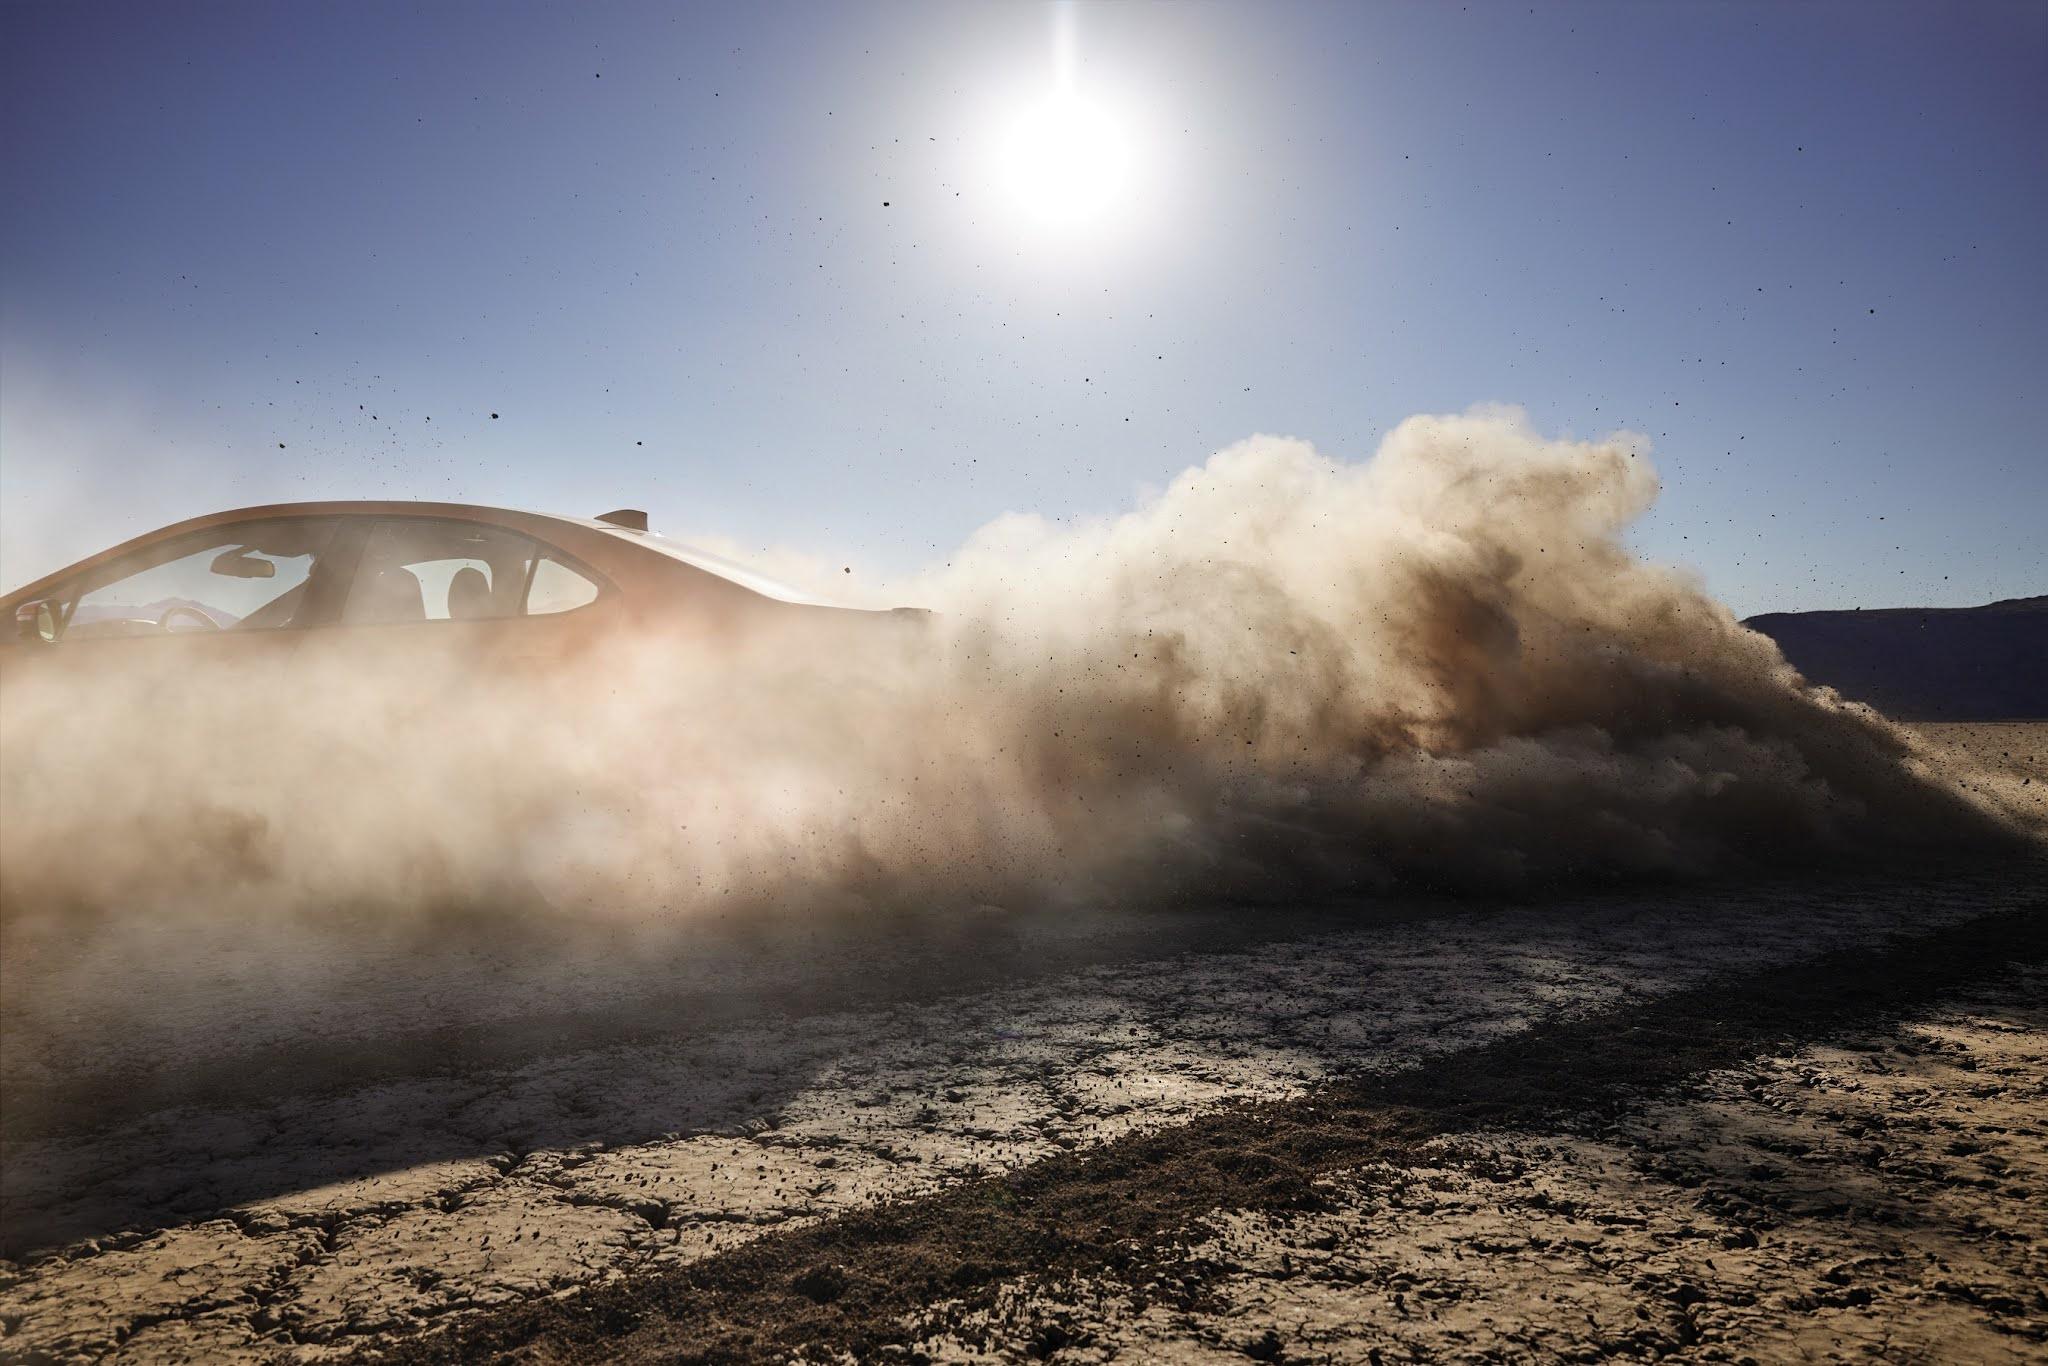 Subaru To Debut All-New 2022 Subaru WRX At The New York International Auto Show